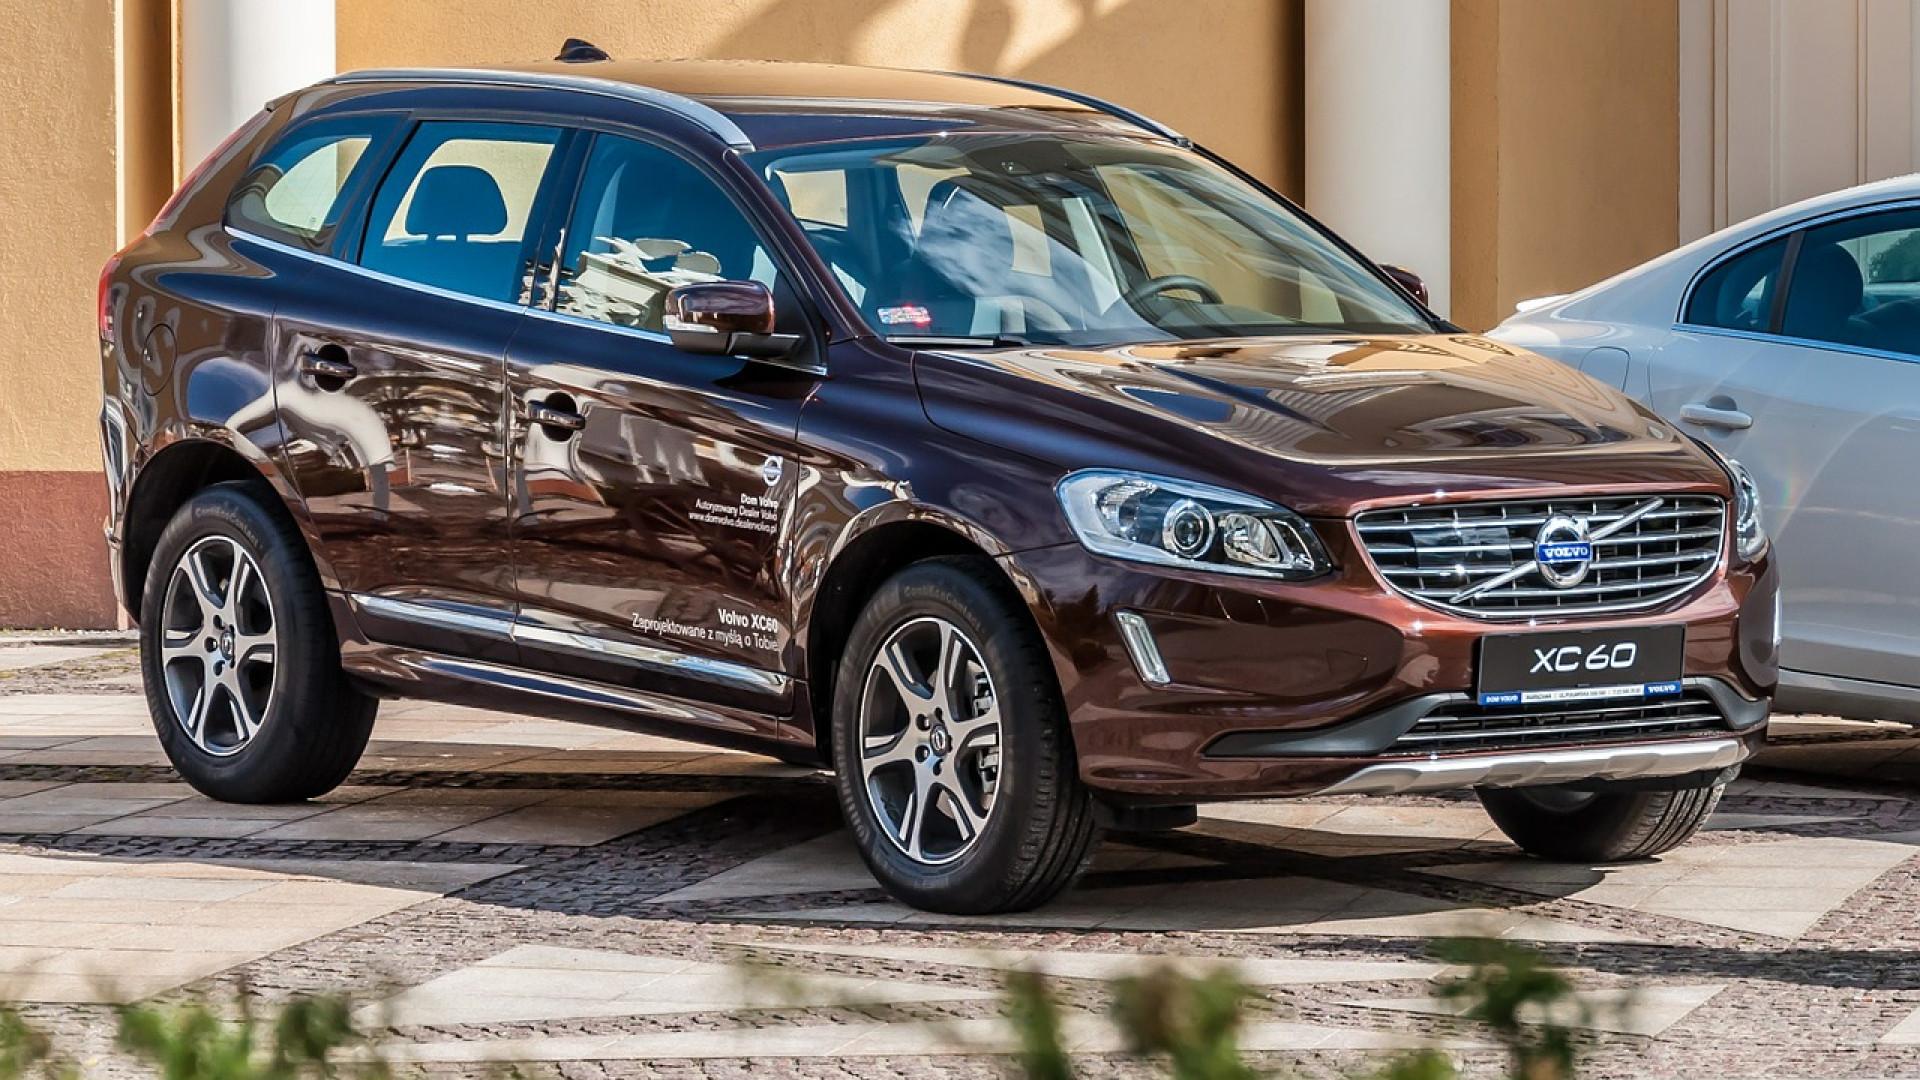 La Volvo XC60 : une voiture prestigieuse à acheter